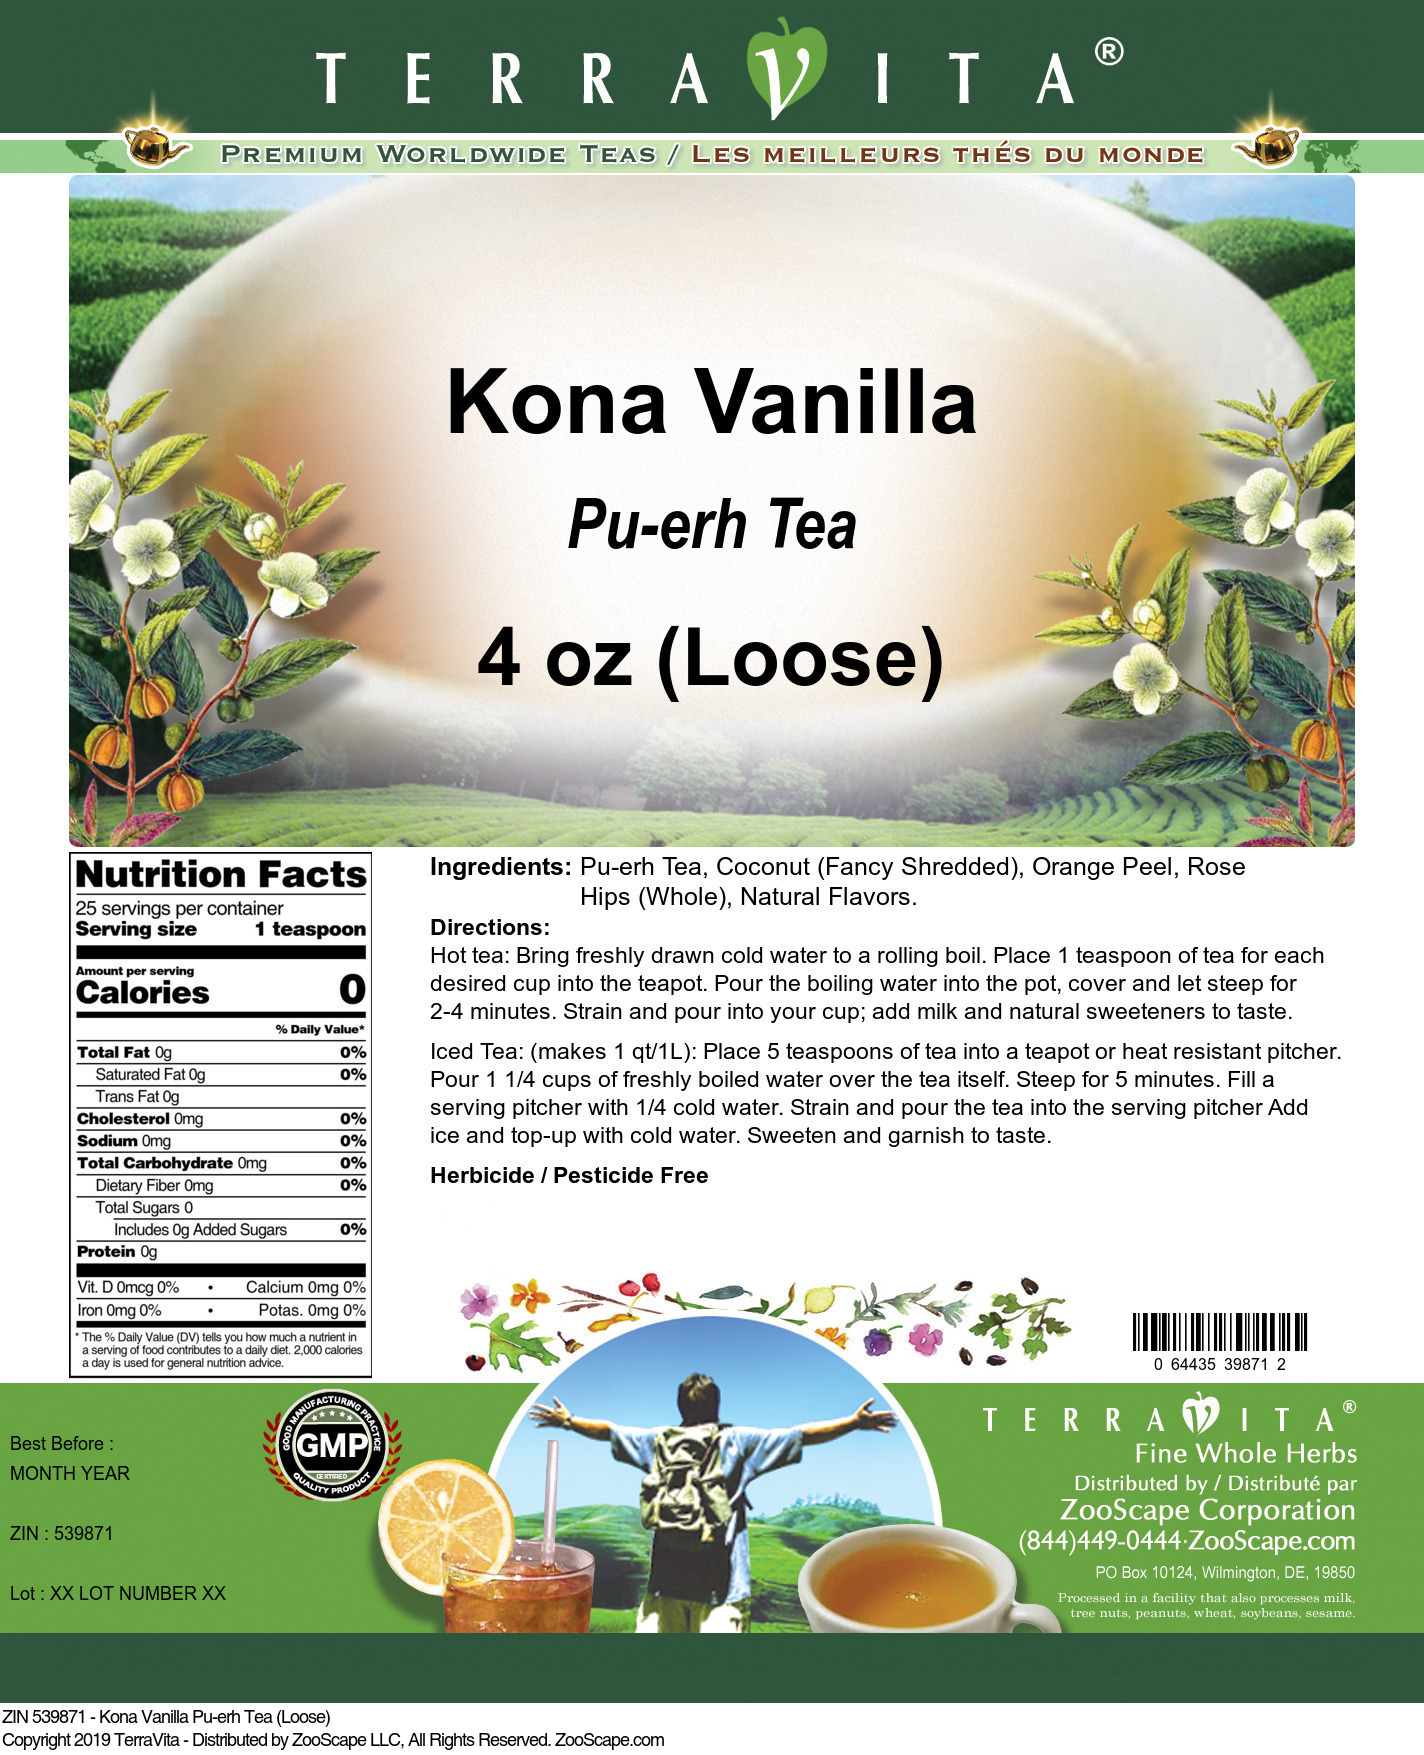 Kona Vanilla Pu-erh Tea (Loose)